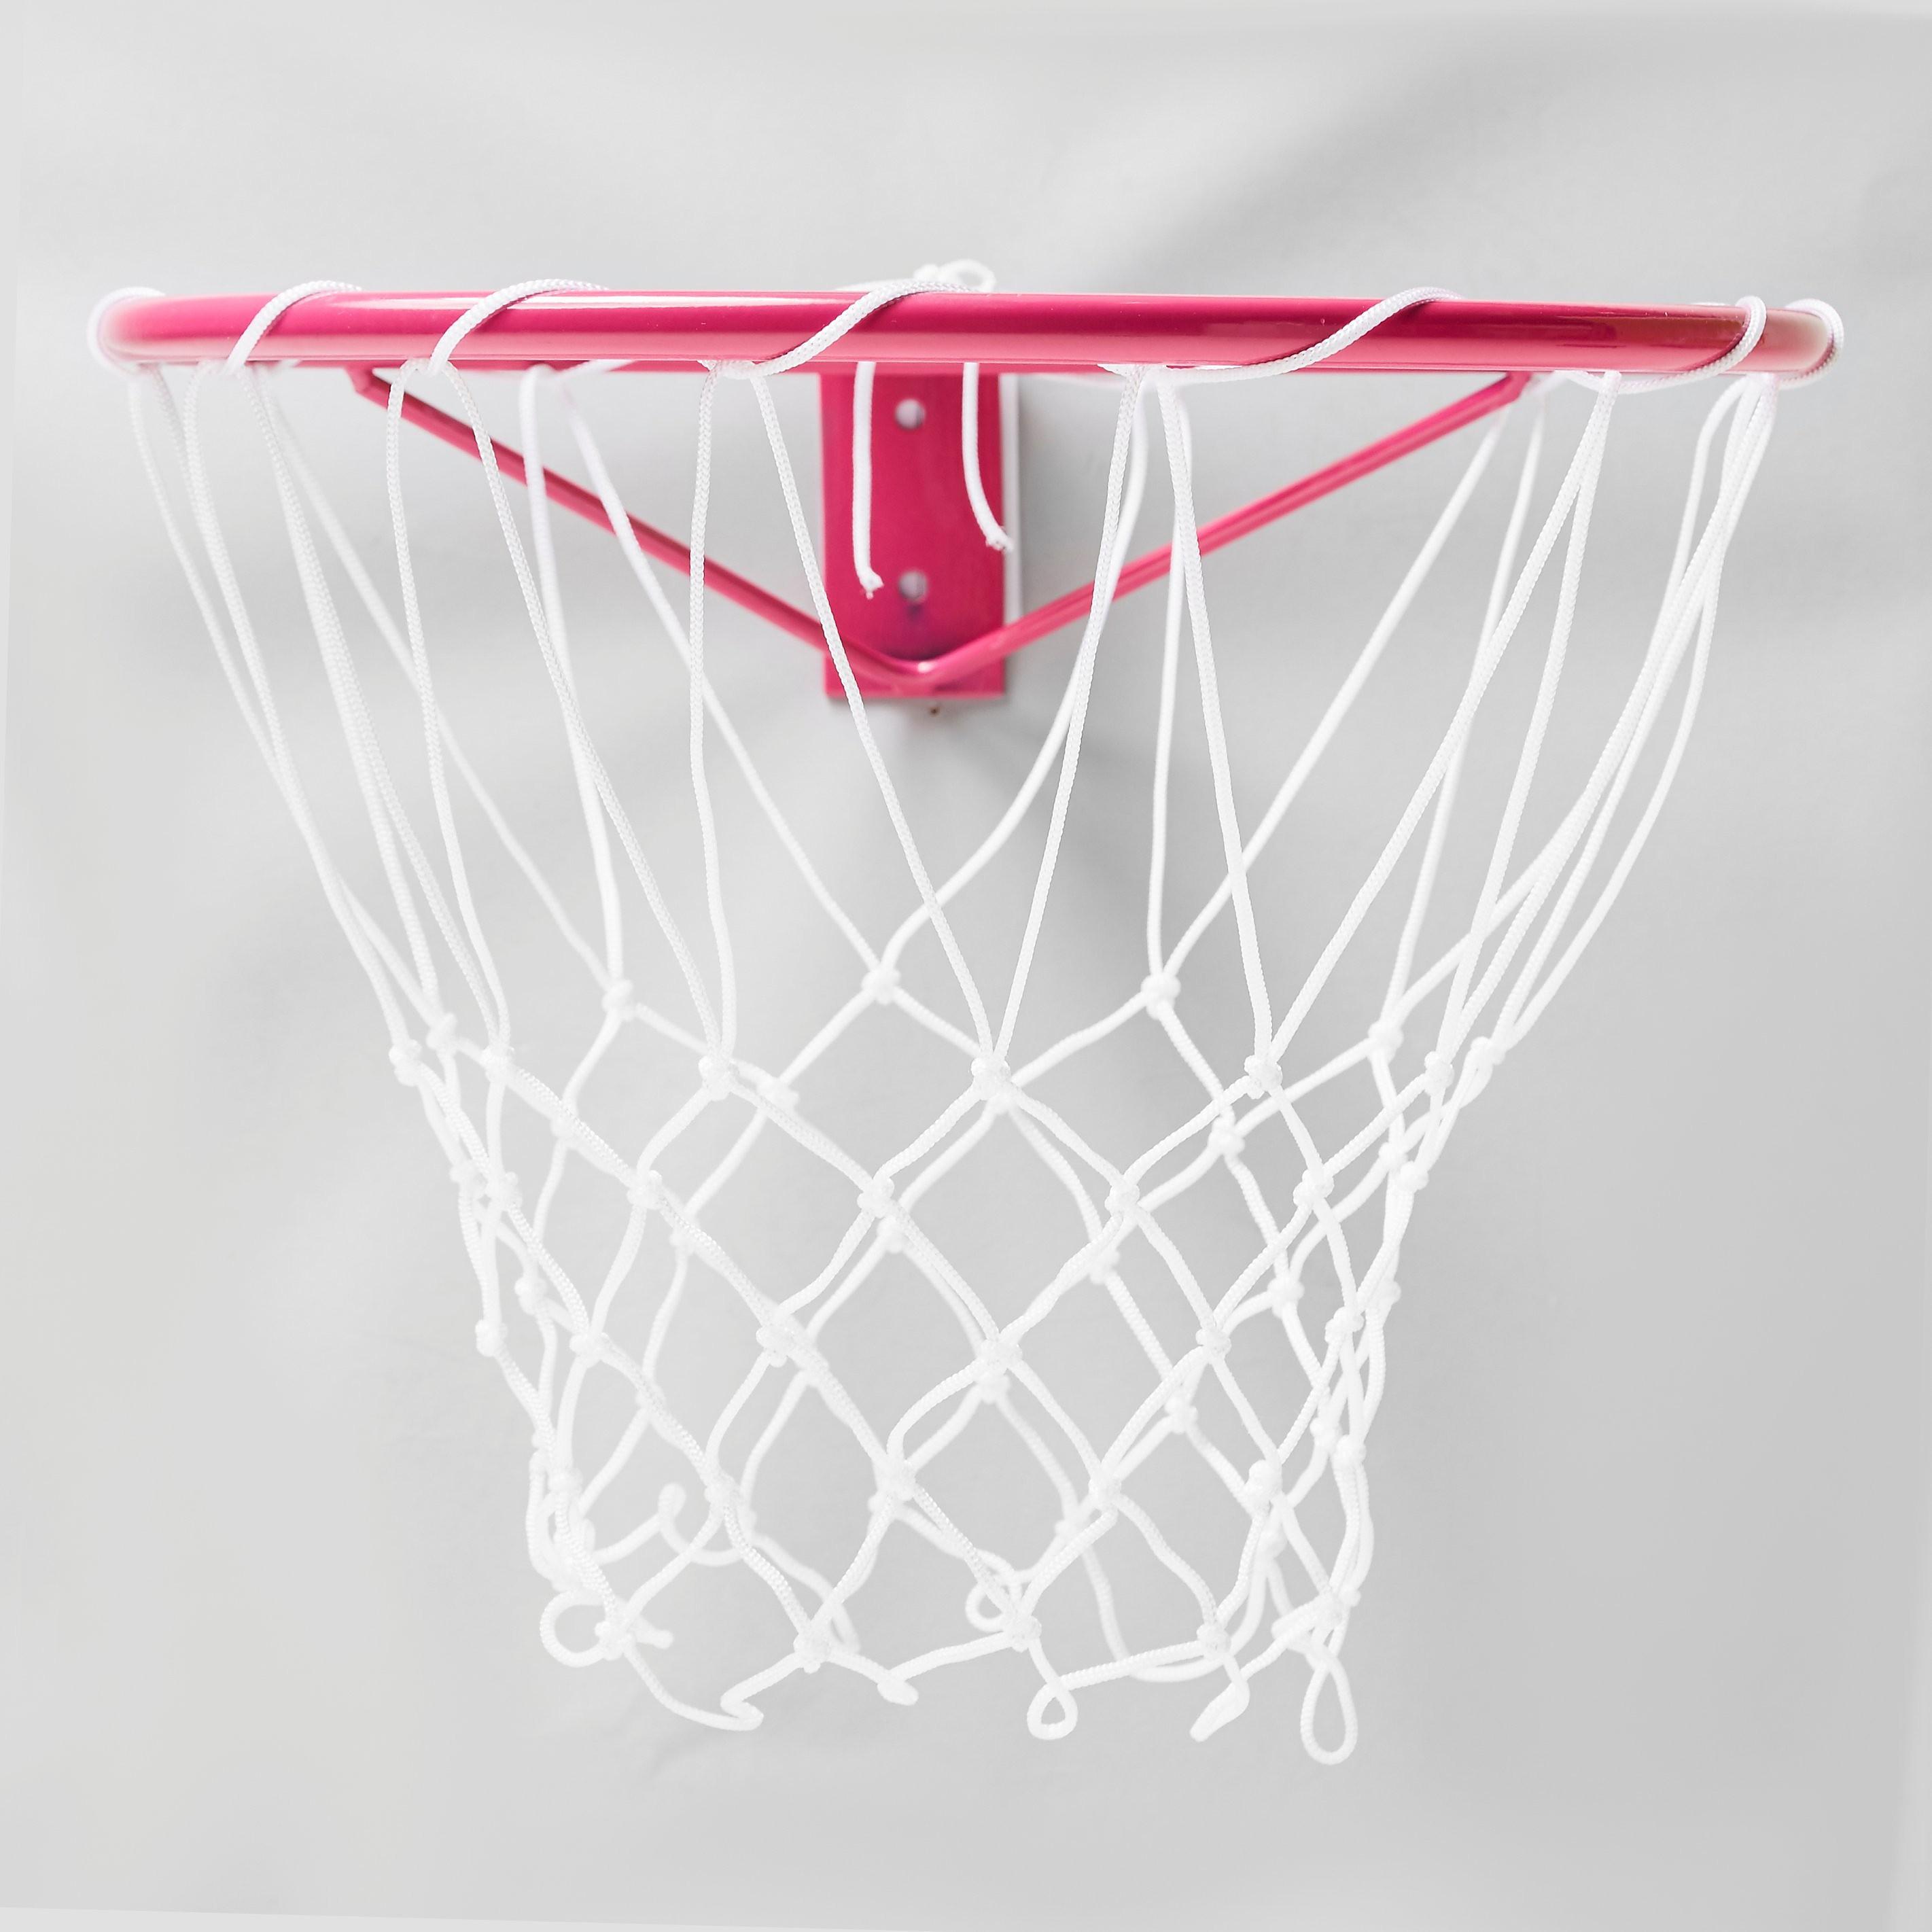 Gilbert Academy Wall Mounted Netball Ring